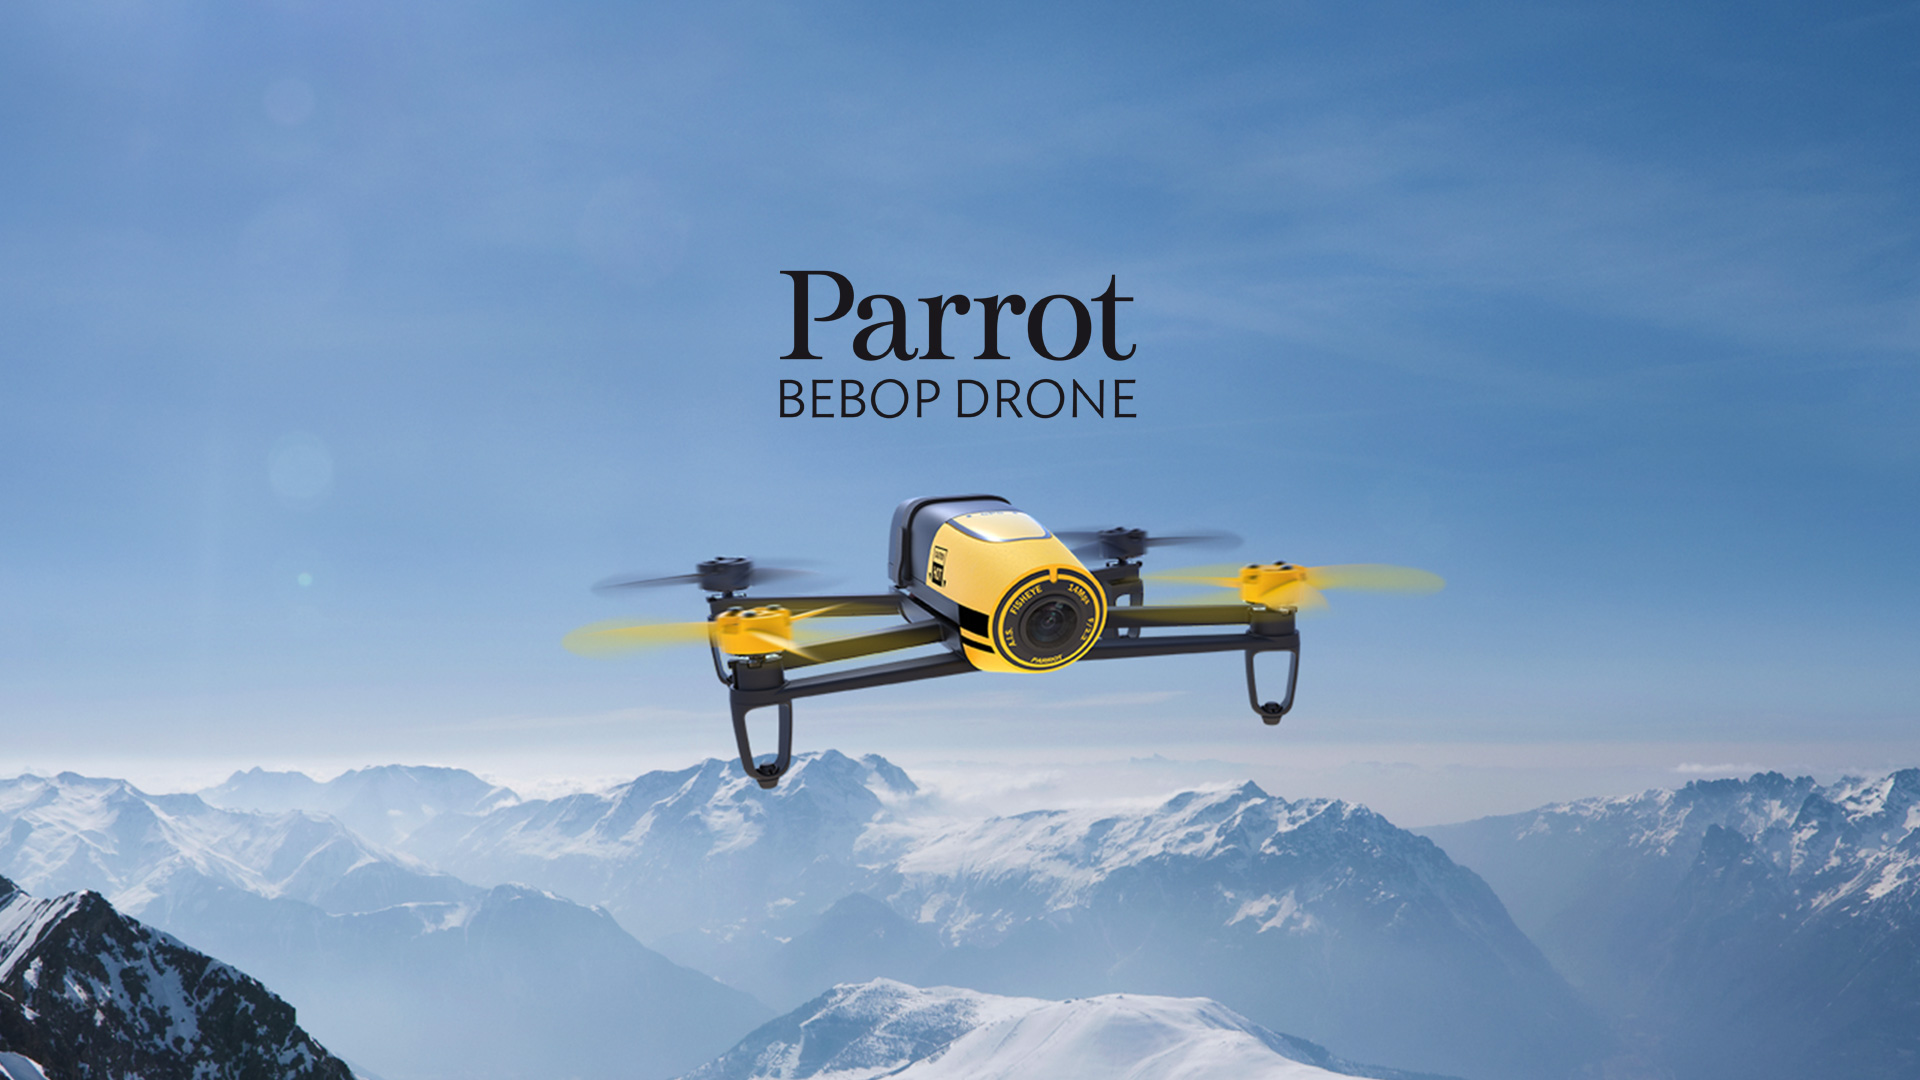 Parrot's $500 14MP Bebop Drone To Take Flight In December